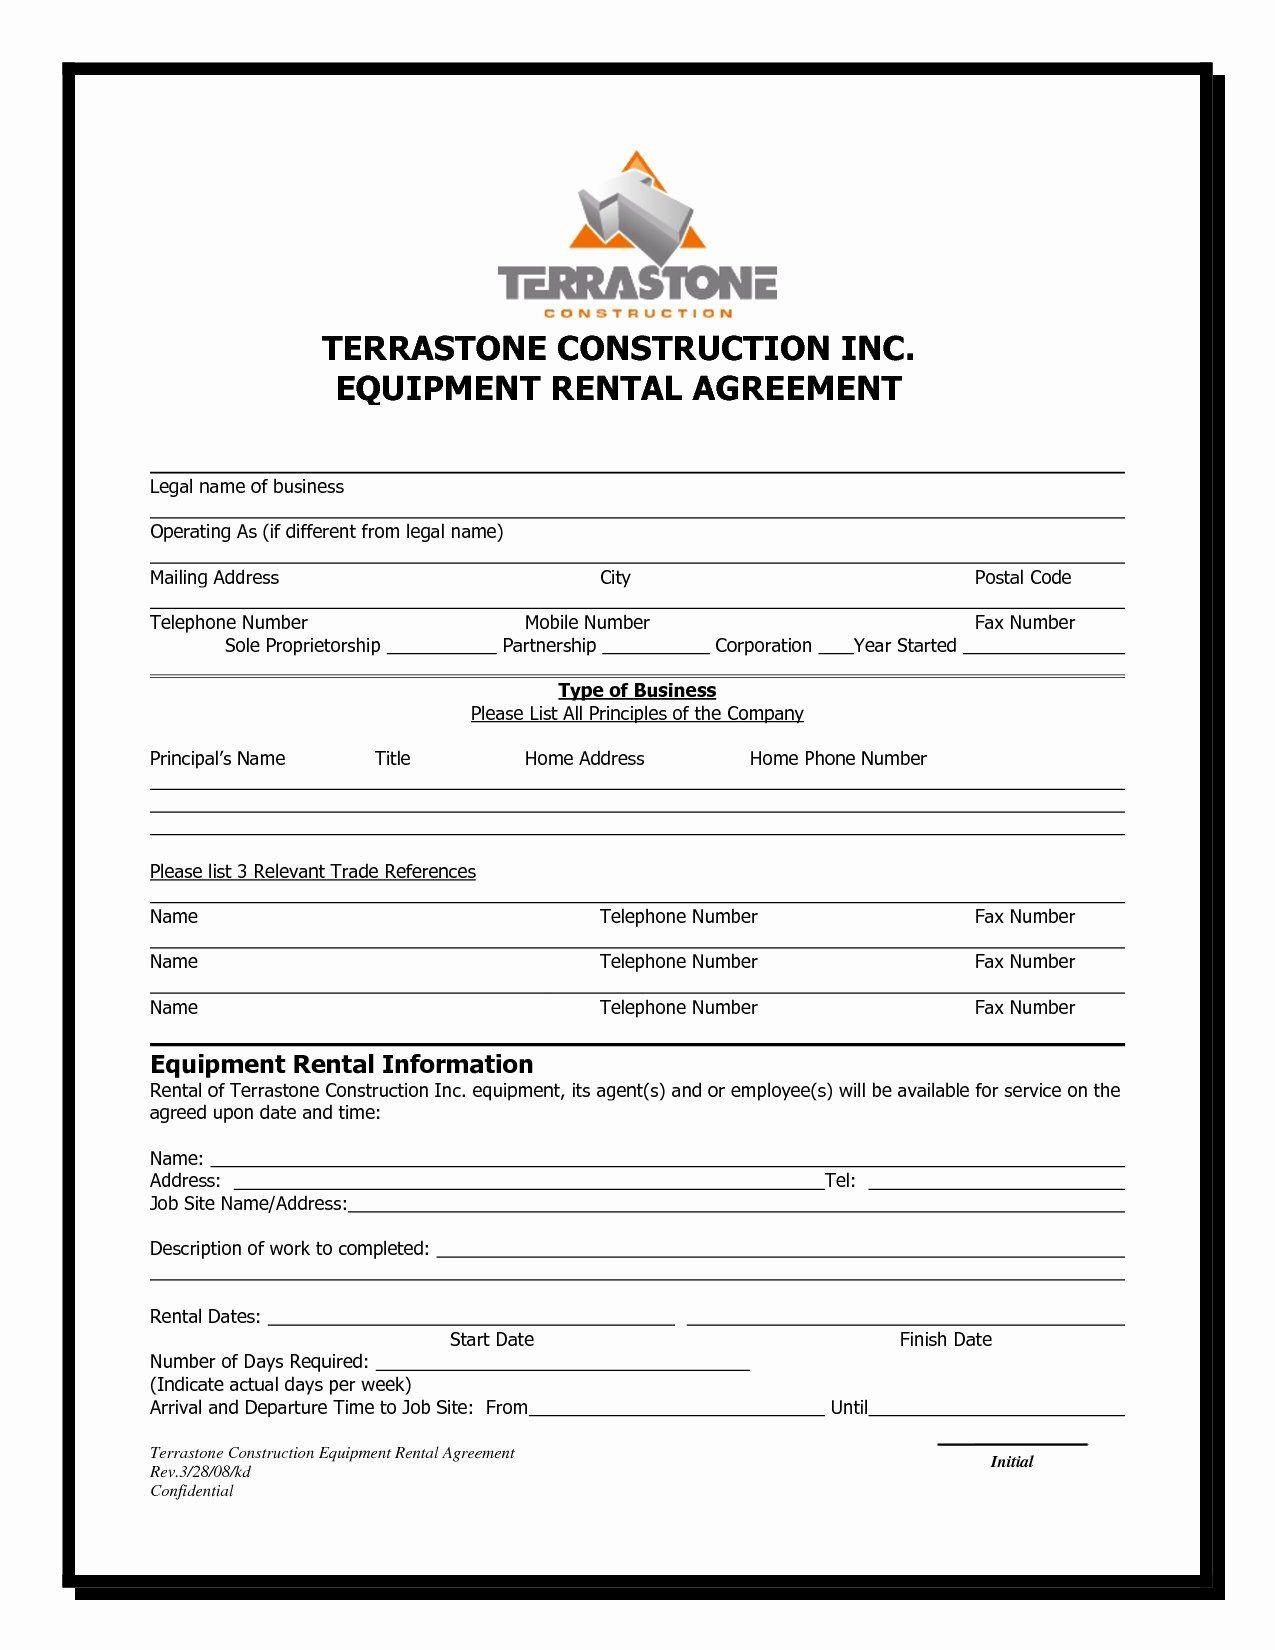 Equipment Purchase Agreement Template Unique Construction Equipment Purchase Agreement New 13 Best Rental Agreement Templates Contract Template Templates